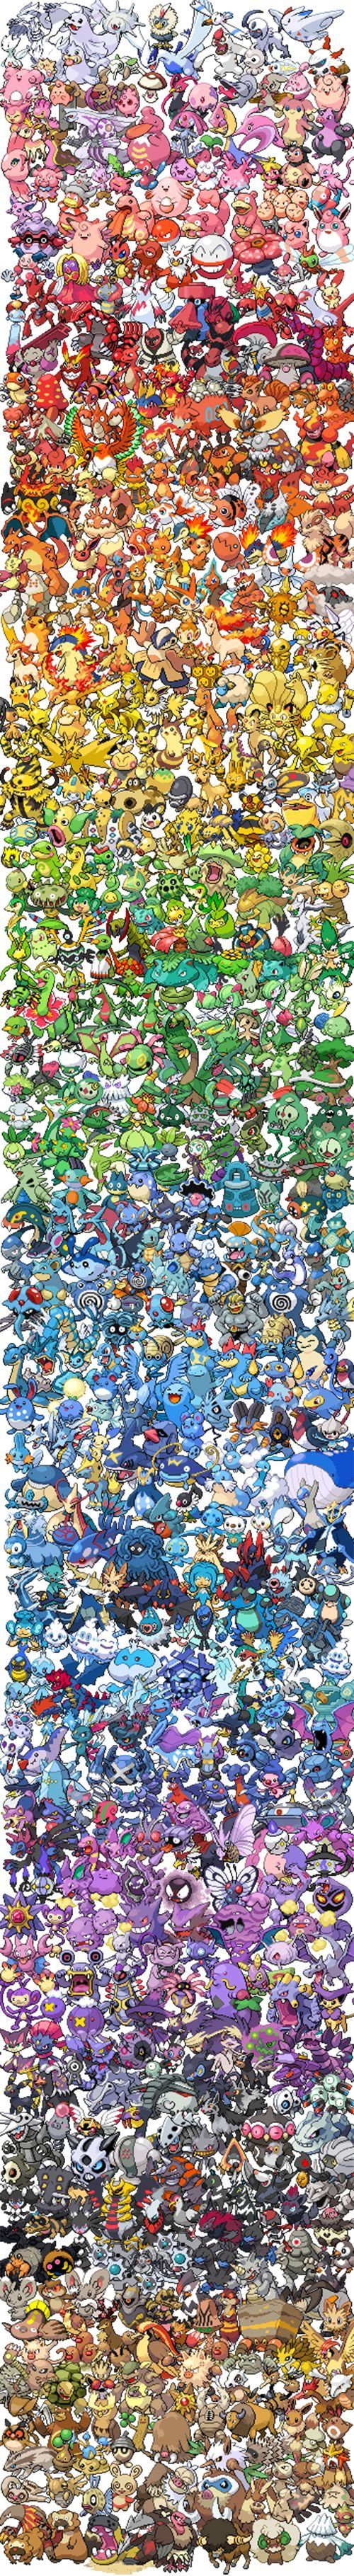 best imagenes de pokemon images on pinterest